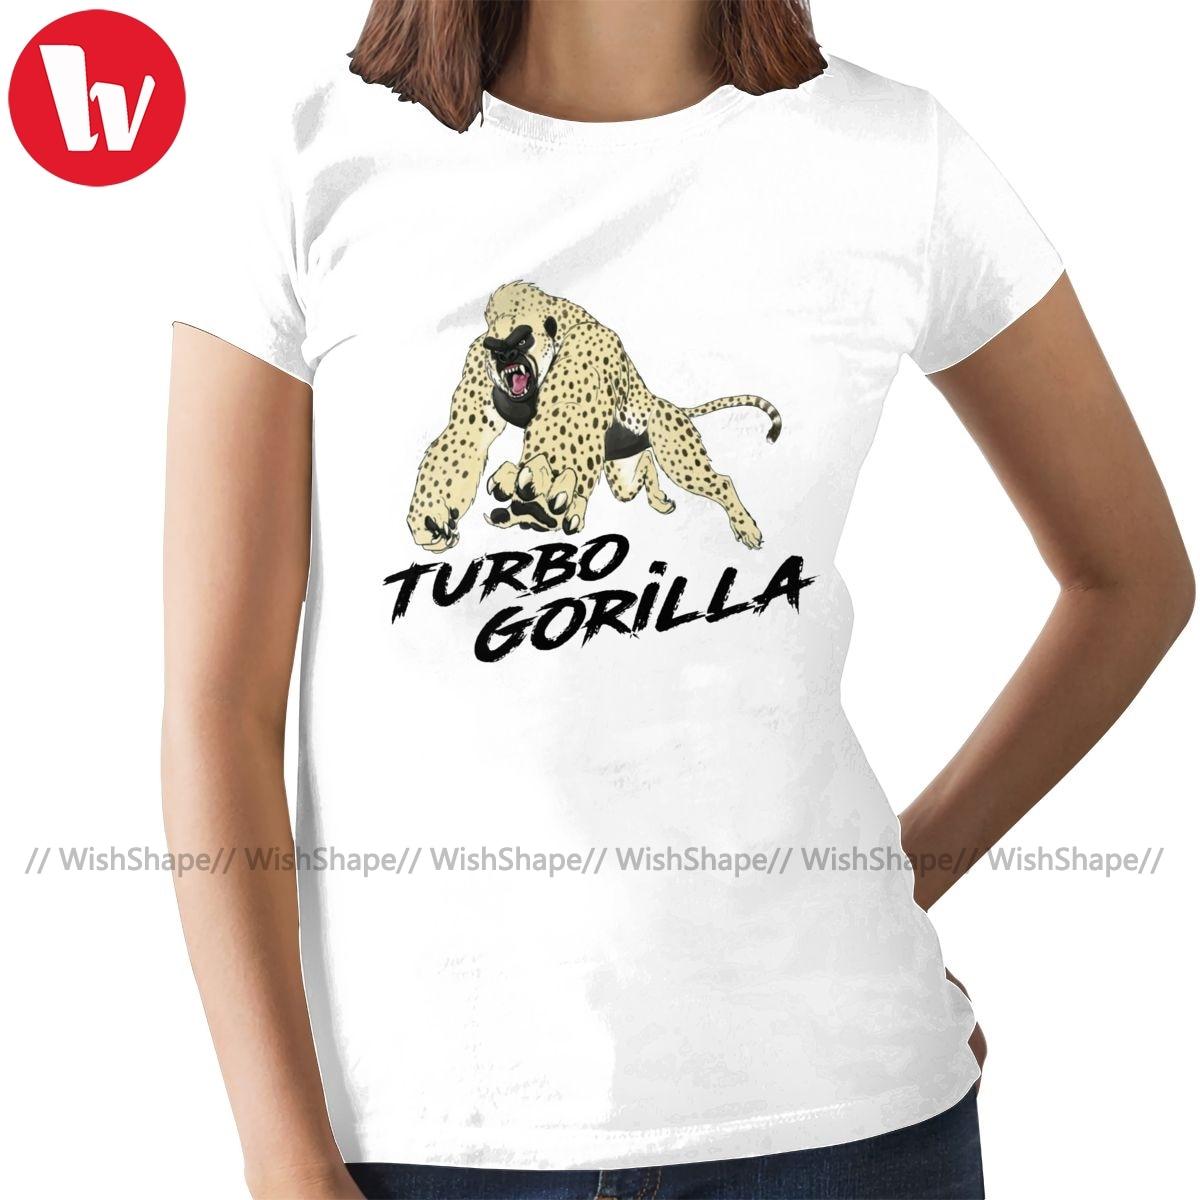 Gorilla T-Shirt The Turbo Gorilla By Racecar T Shirt Street Wear Short-Sleeve Women tshirt Ladies Tee Shirt